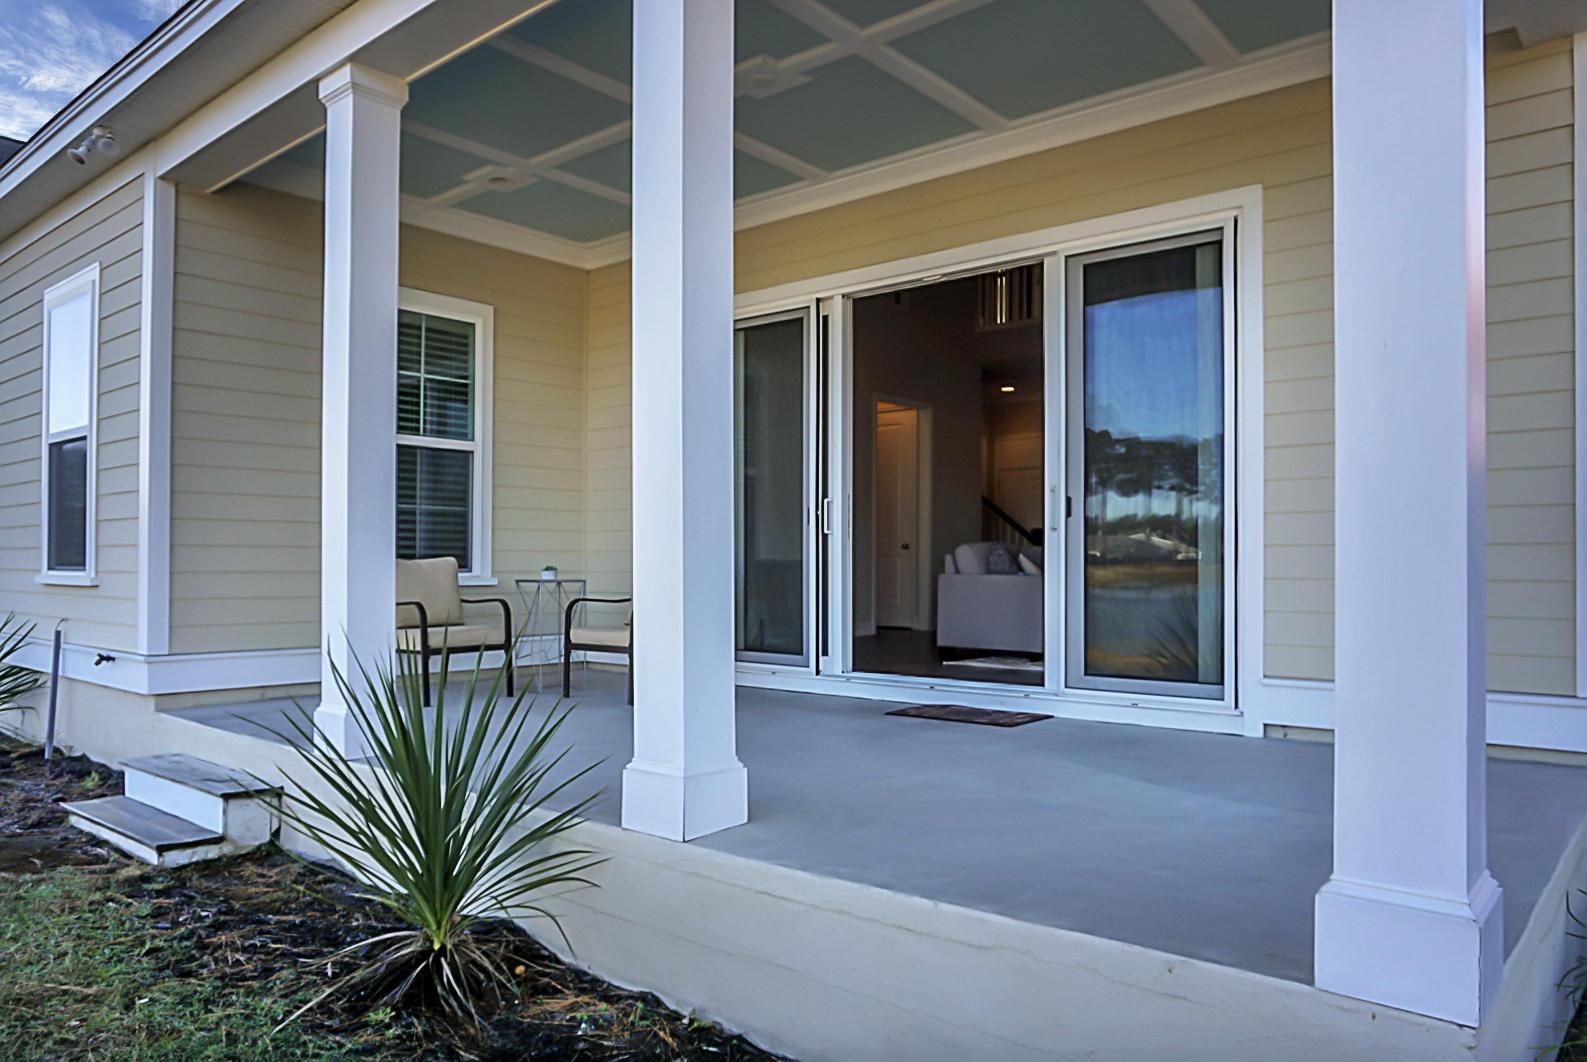 Cane Bay Plantation Homes For Sale - 284 Calm Water, Summerville, SC - 30